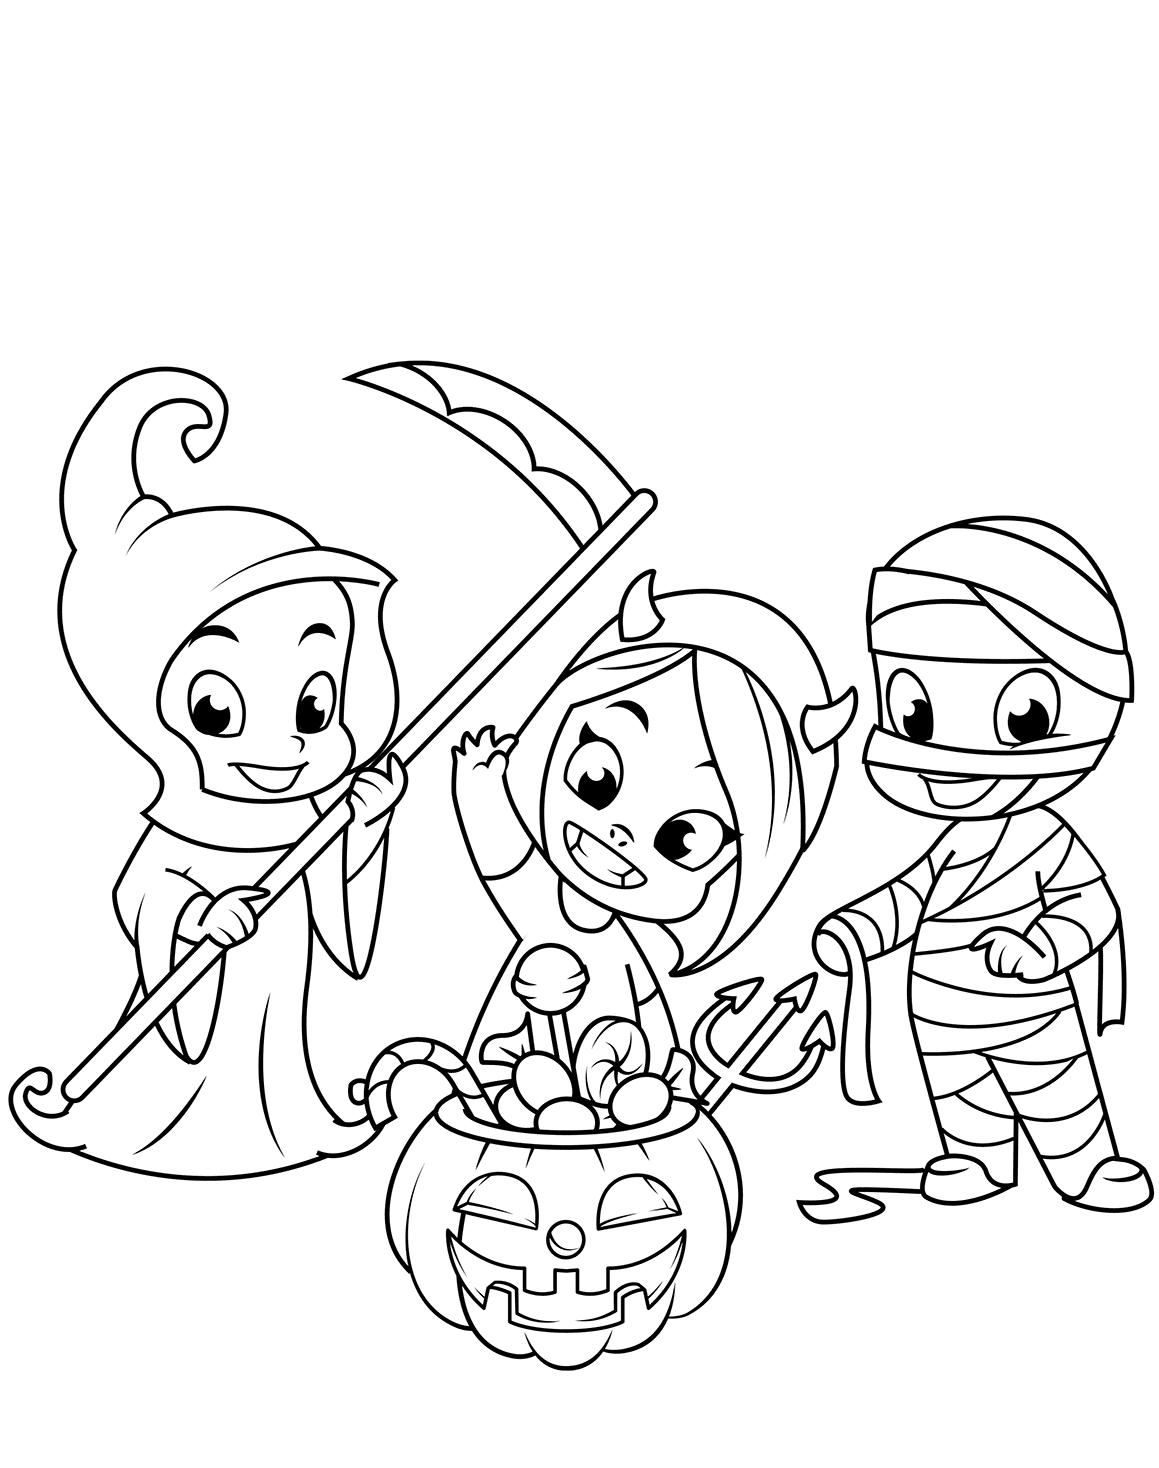 Coloriage de costumes d'Halloween